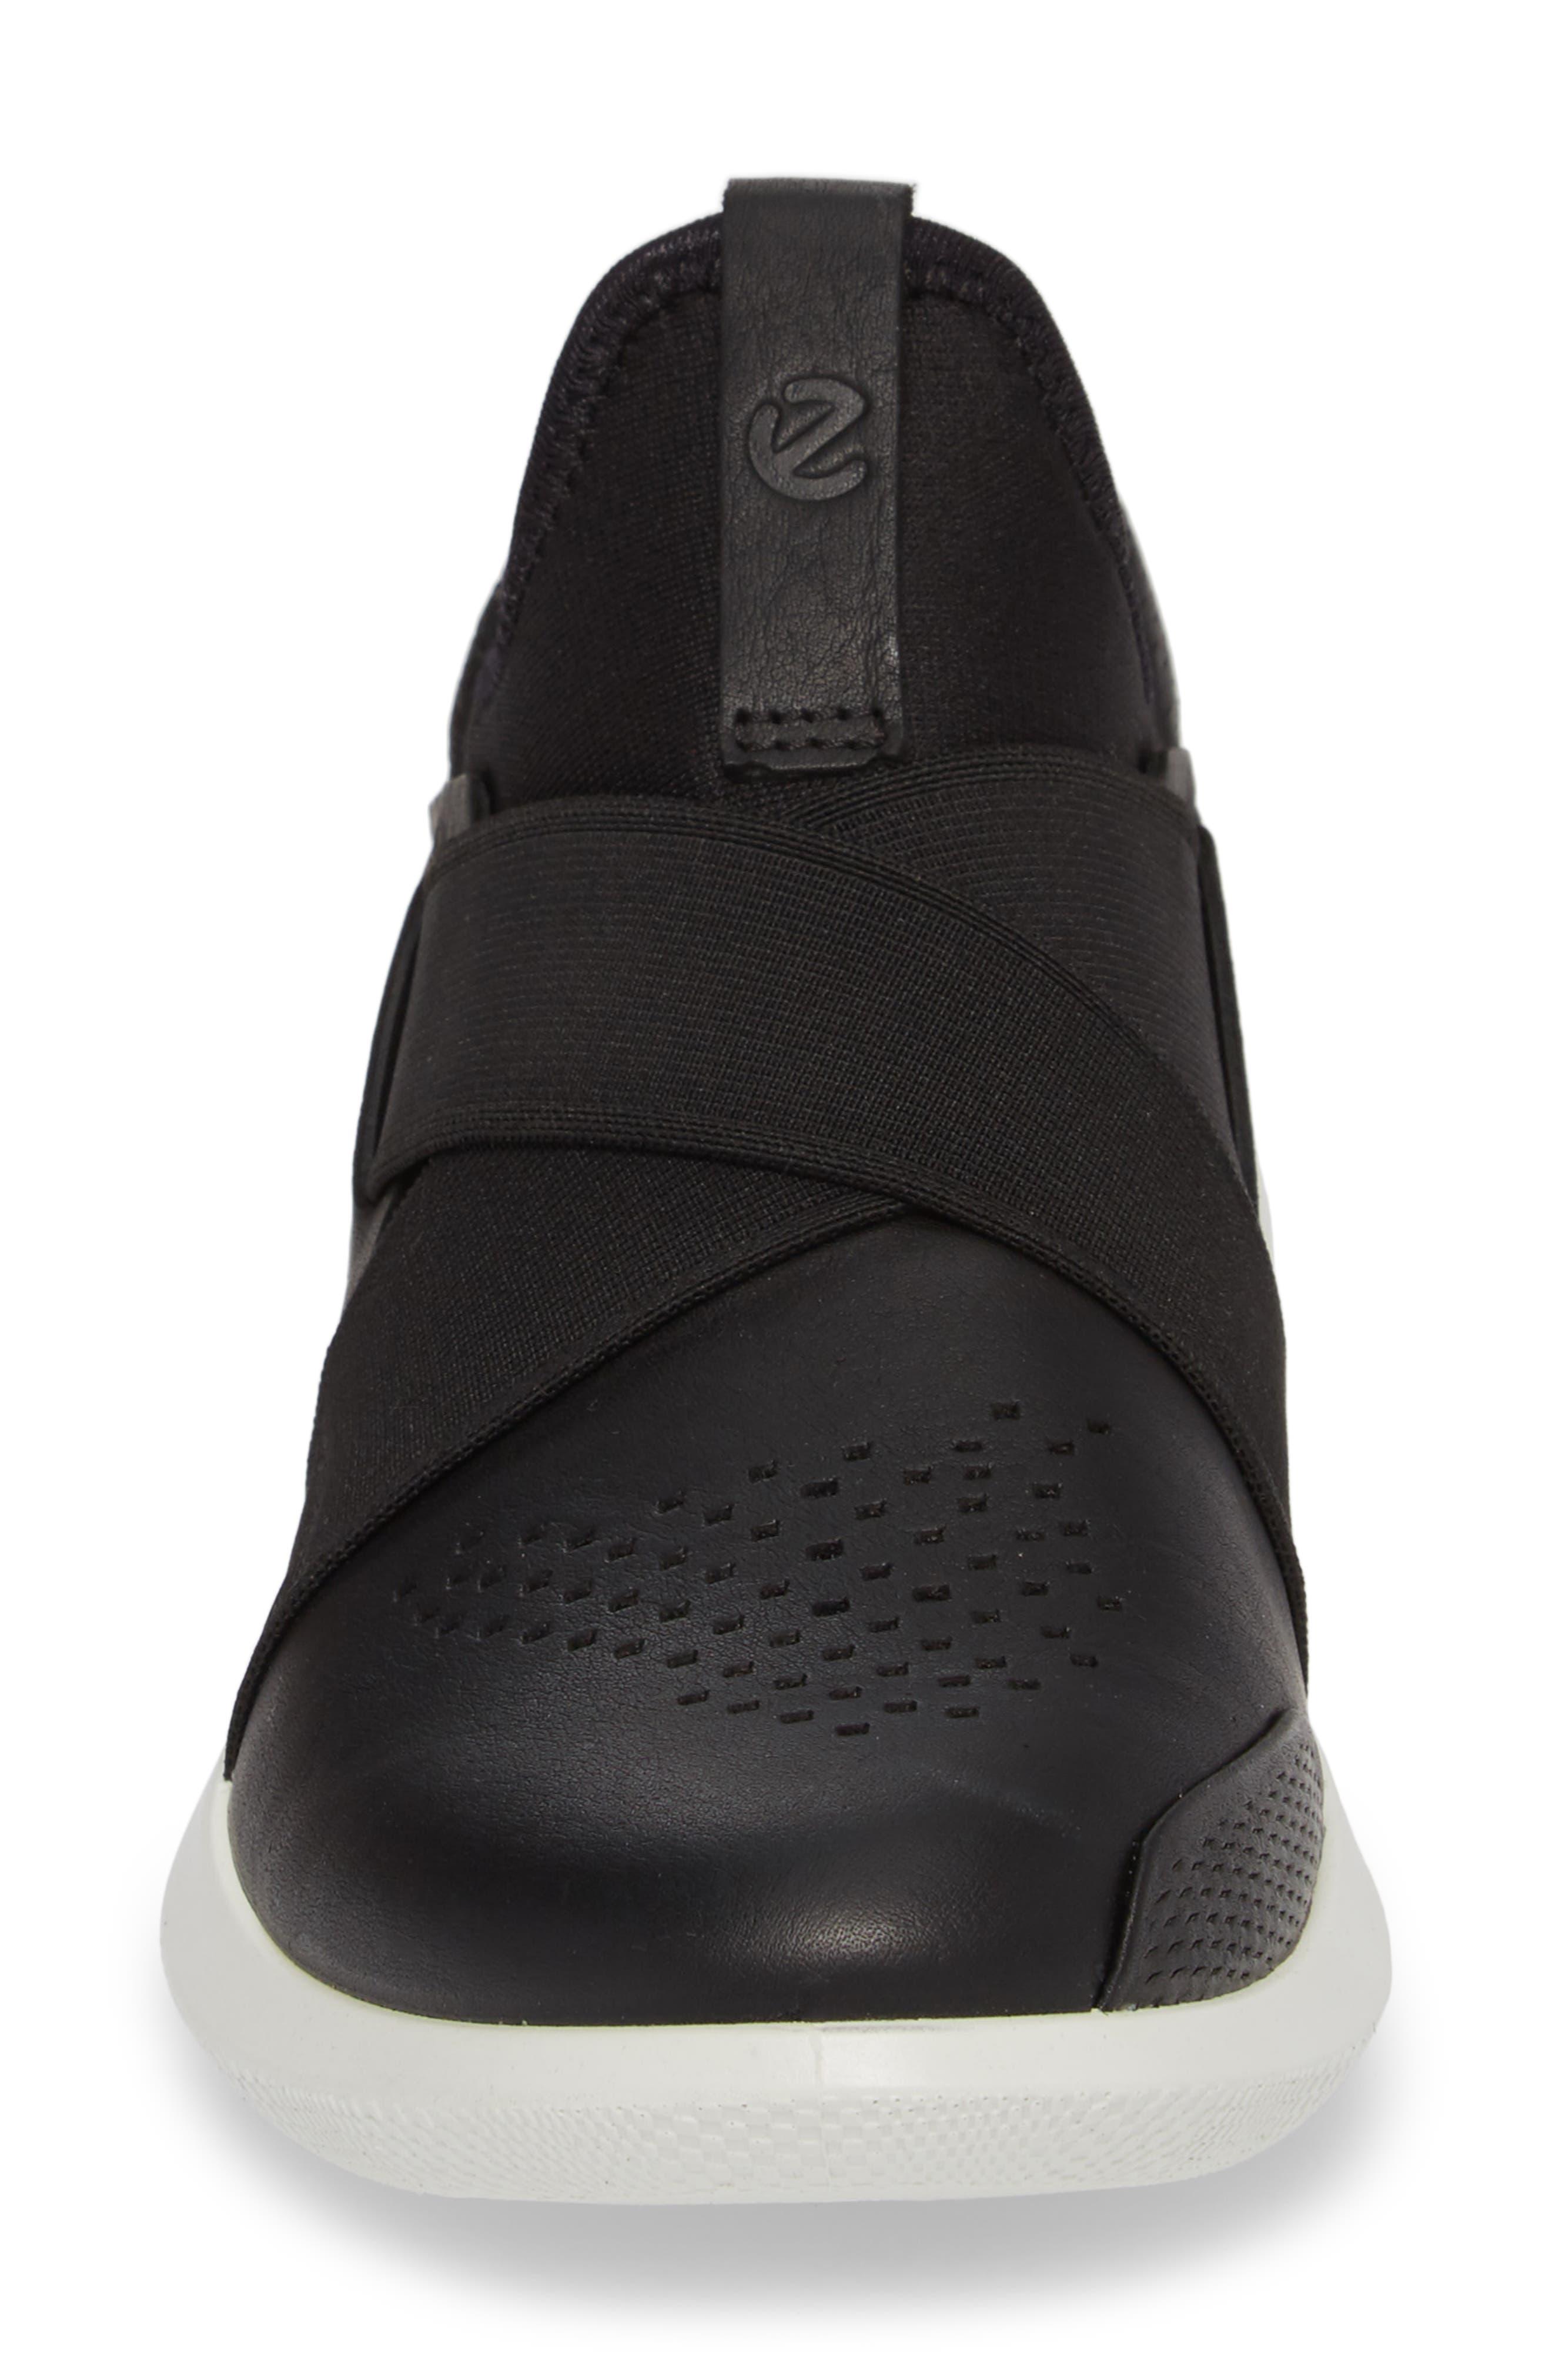 Scinapse Band Sneaker,                             Alternate thumbnail 4, color,                             Black